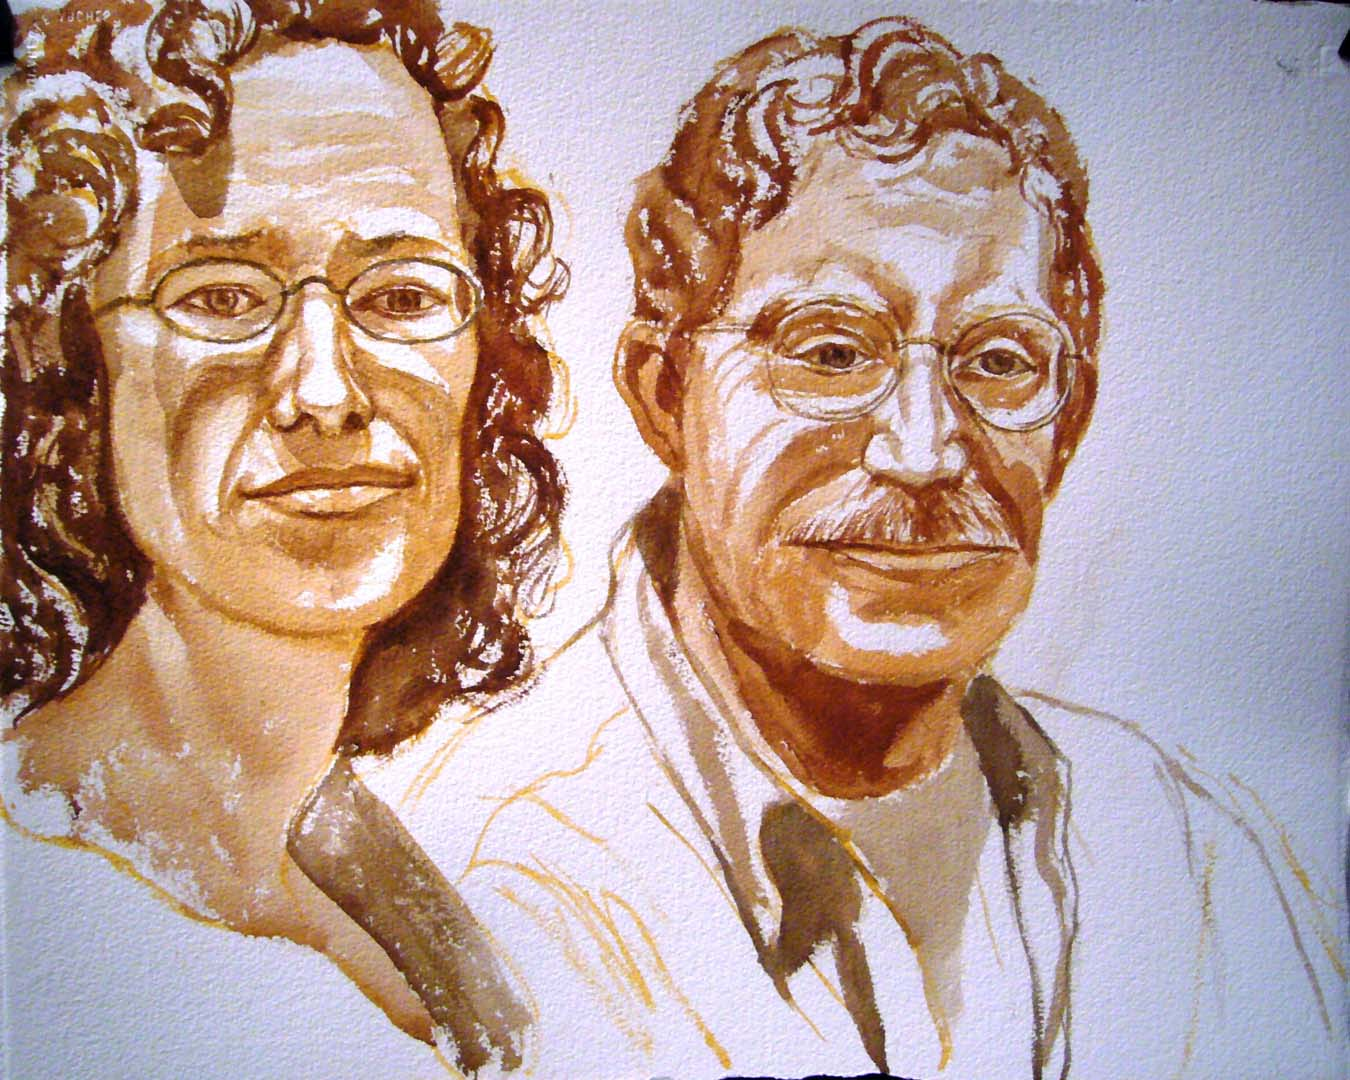 "2007 Portrait of Joe & _____ Miller Sepia wash 18"" x 22"""